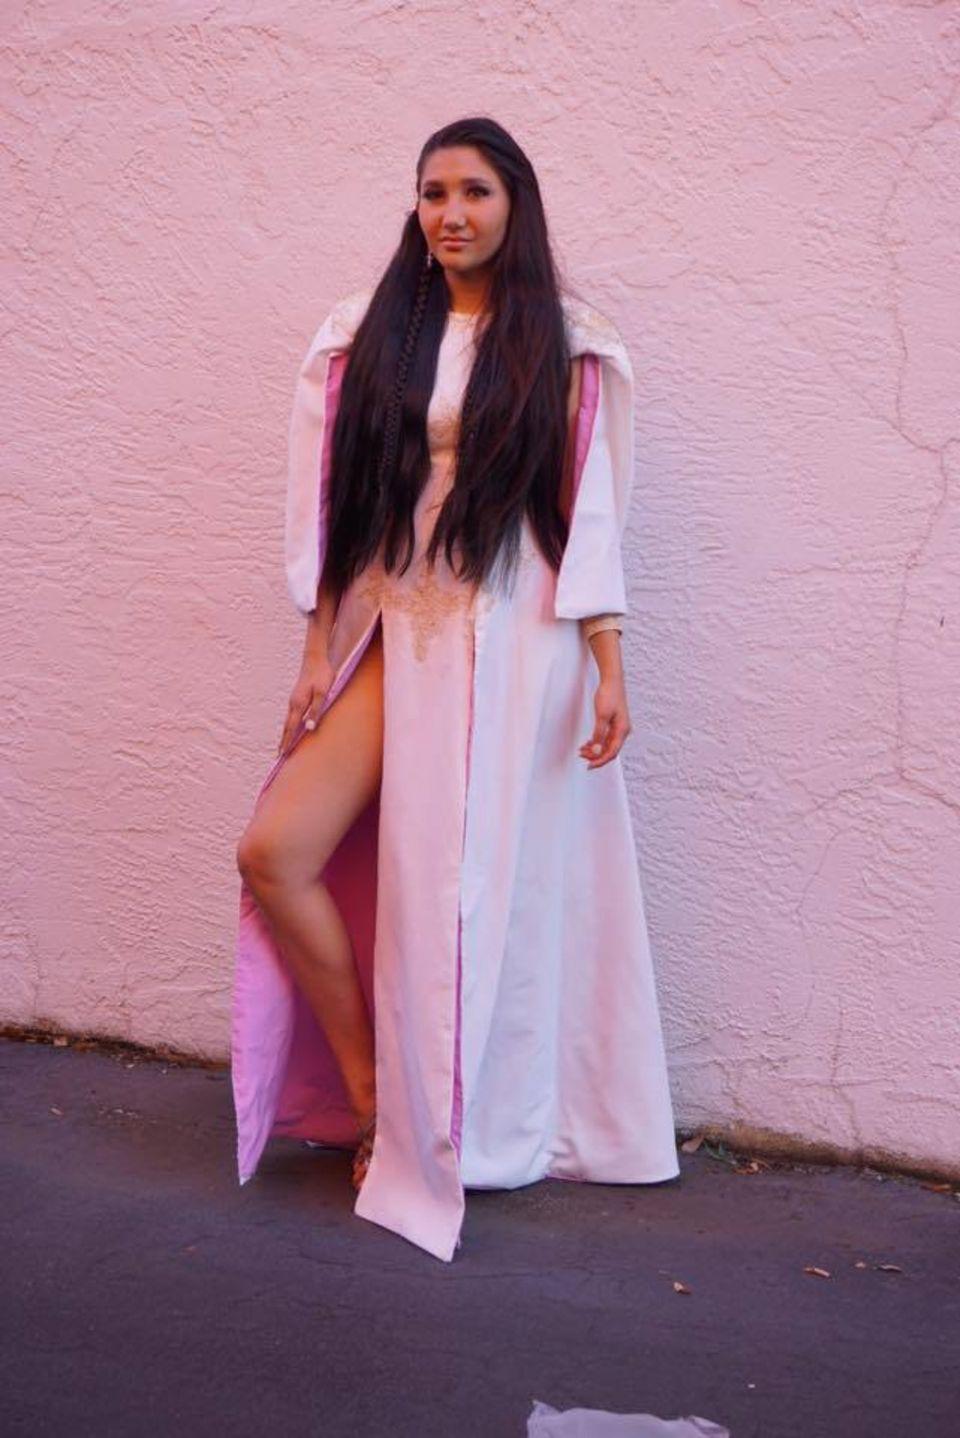 Too provocative for prom? Mobile-made dress gets Alabama ...